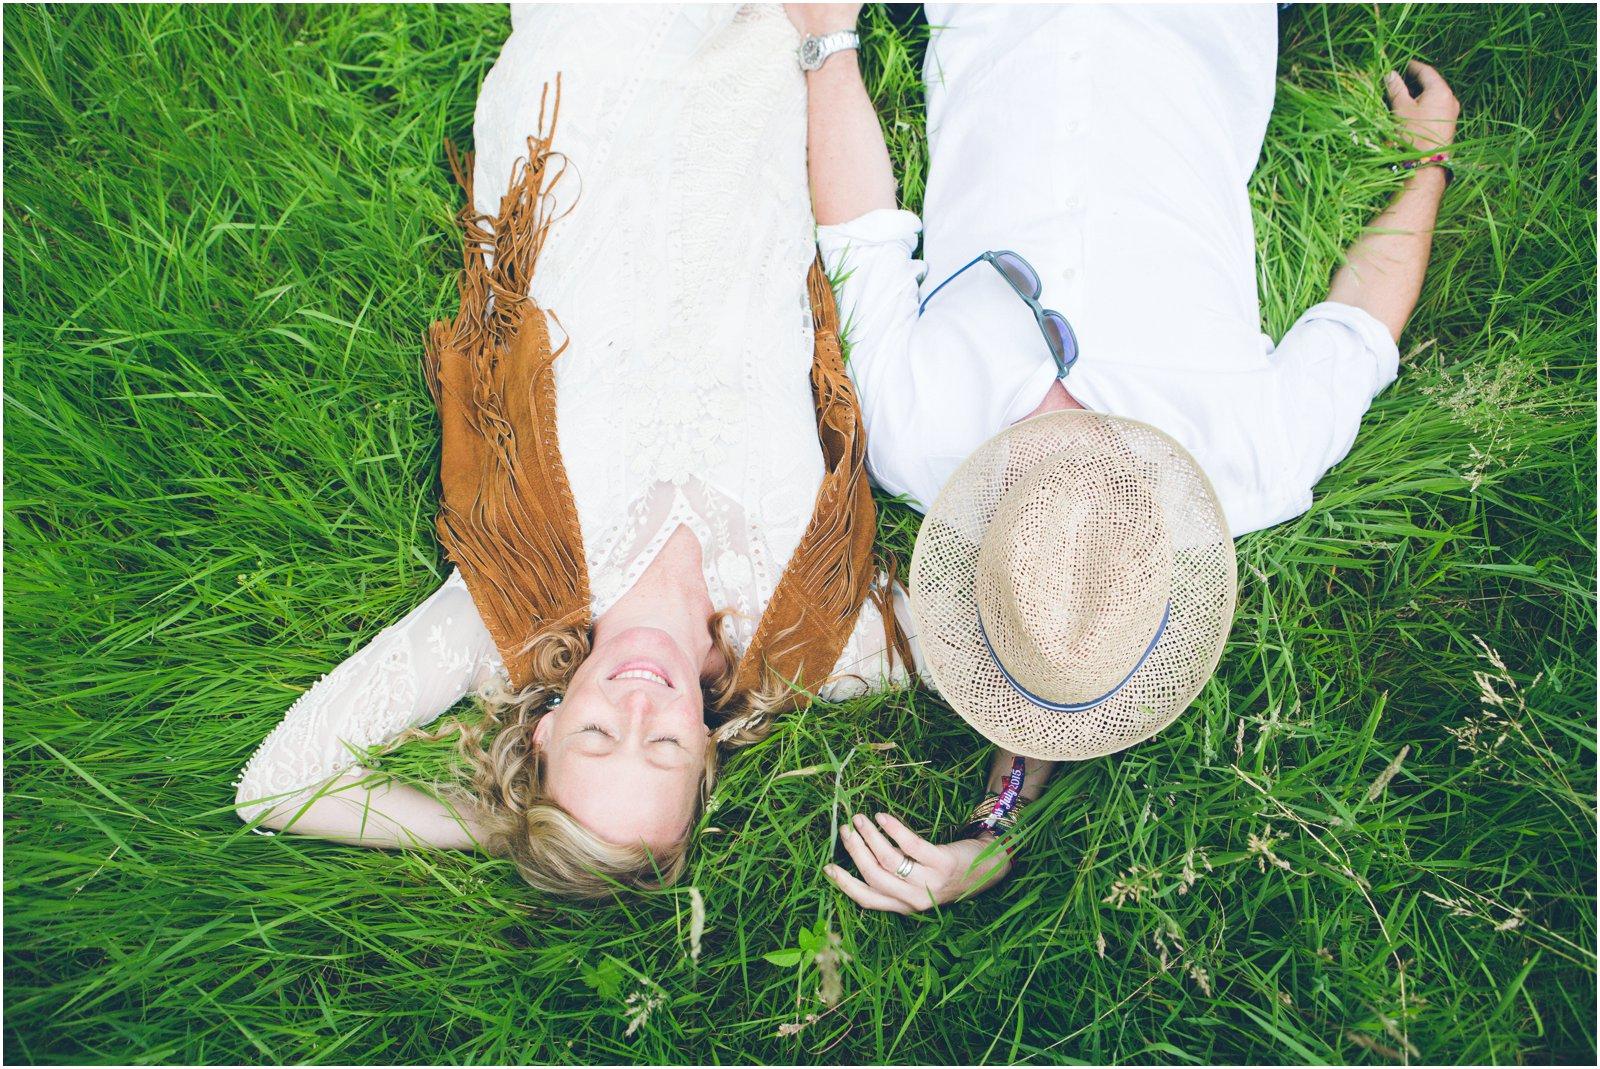 Sally and Damien's wedding festival by Summertown Pictures-78_DerrynSchmidt